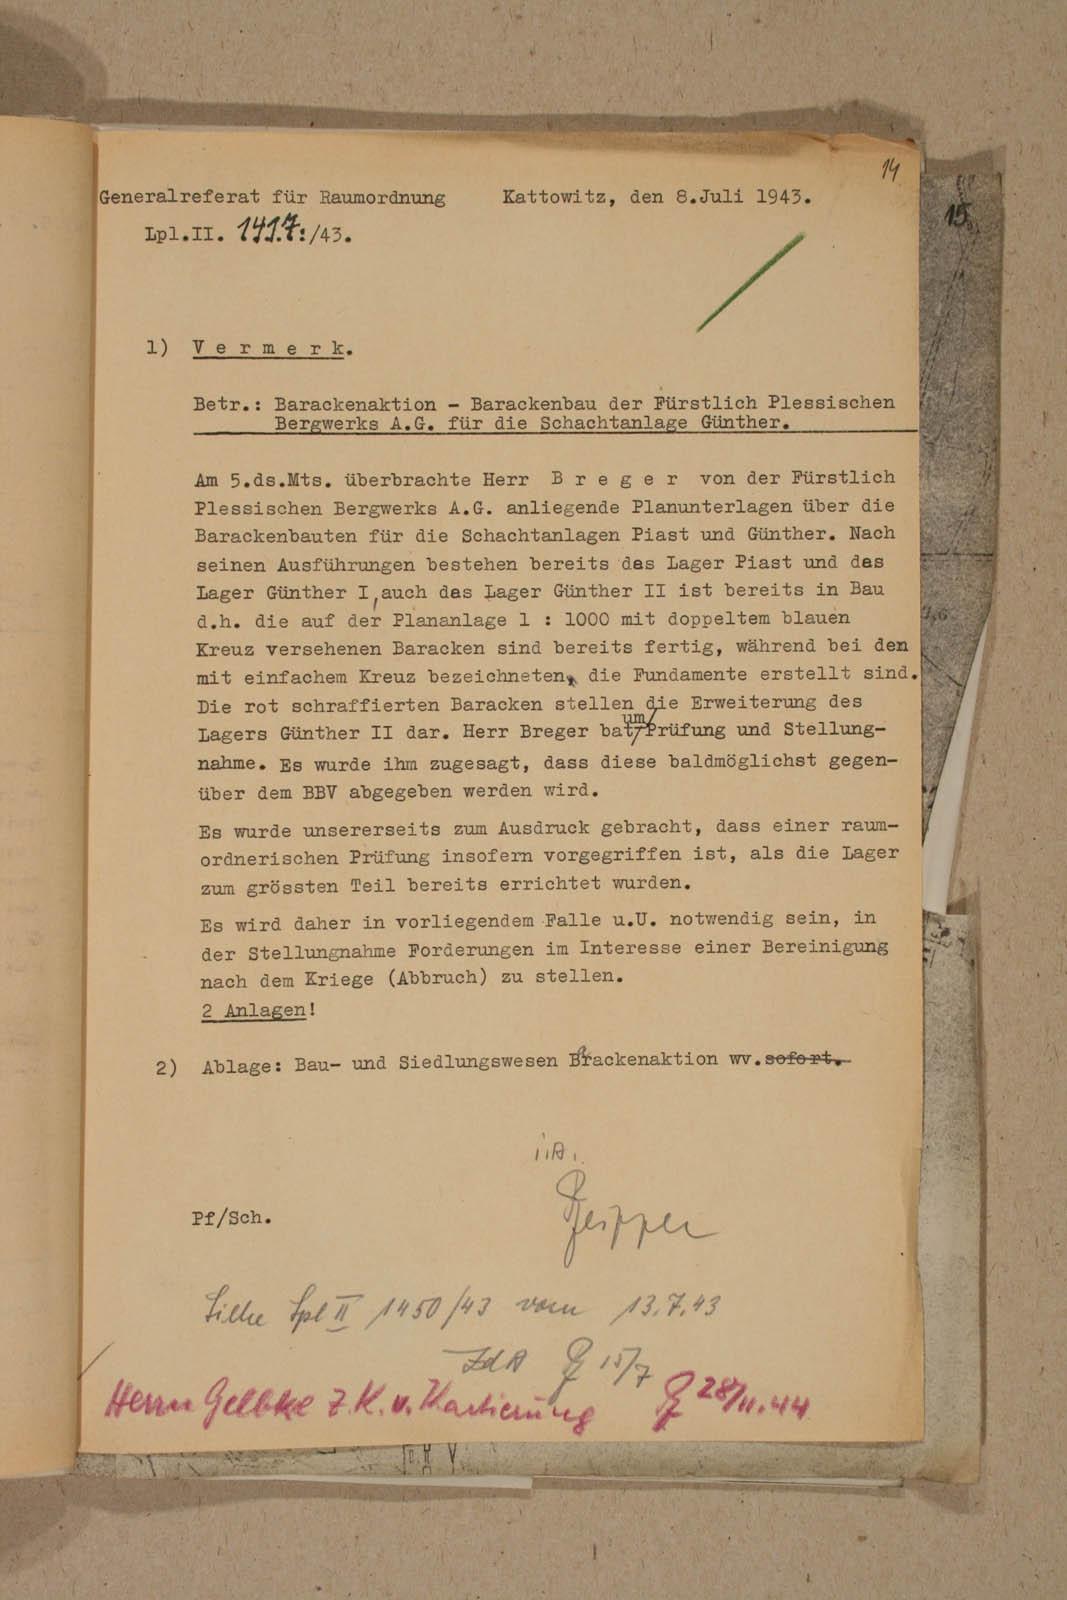 Archiwum Panstwowe w Katowicach Land Pl 12 120 708 14